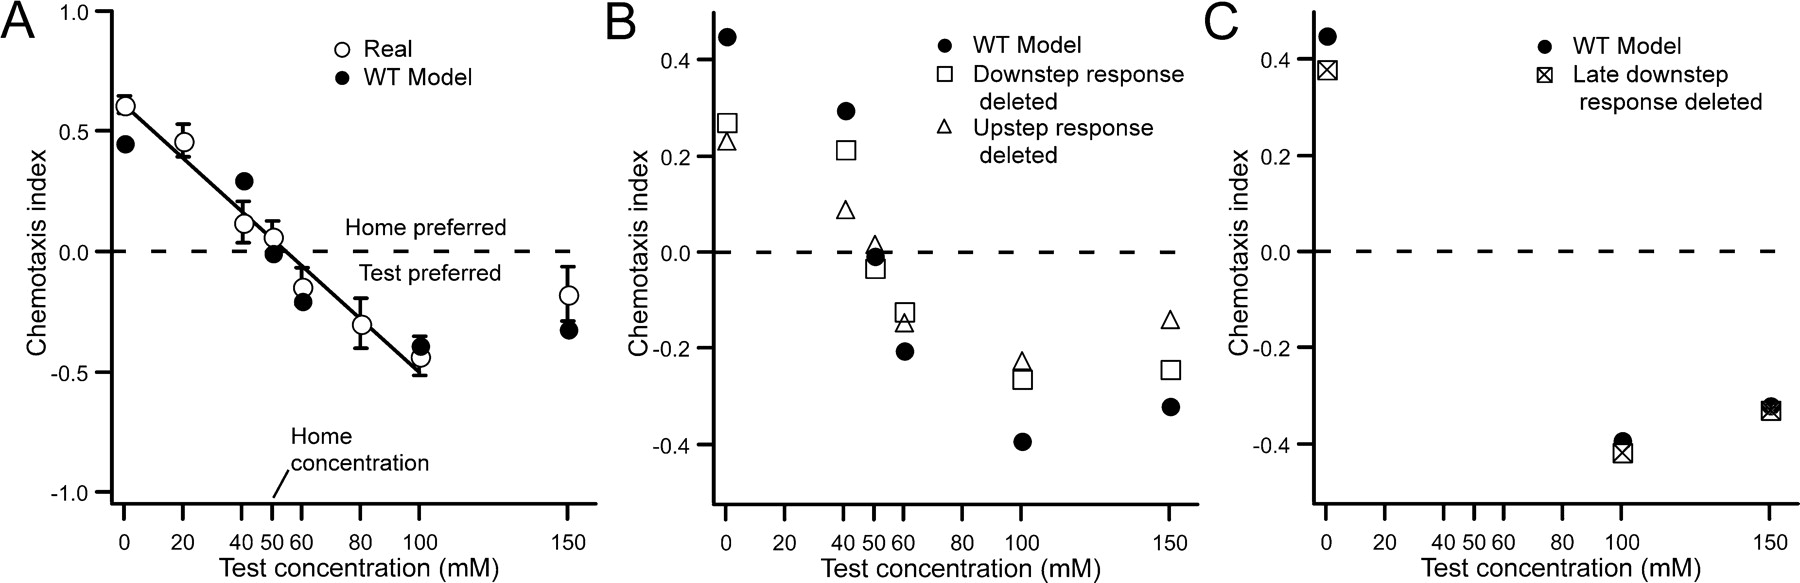 Step response analysis of chemotaxis in caenorhabditis elegans download figure open in new tab buycottarizona